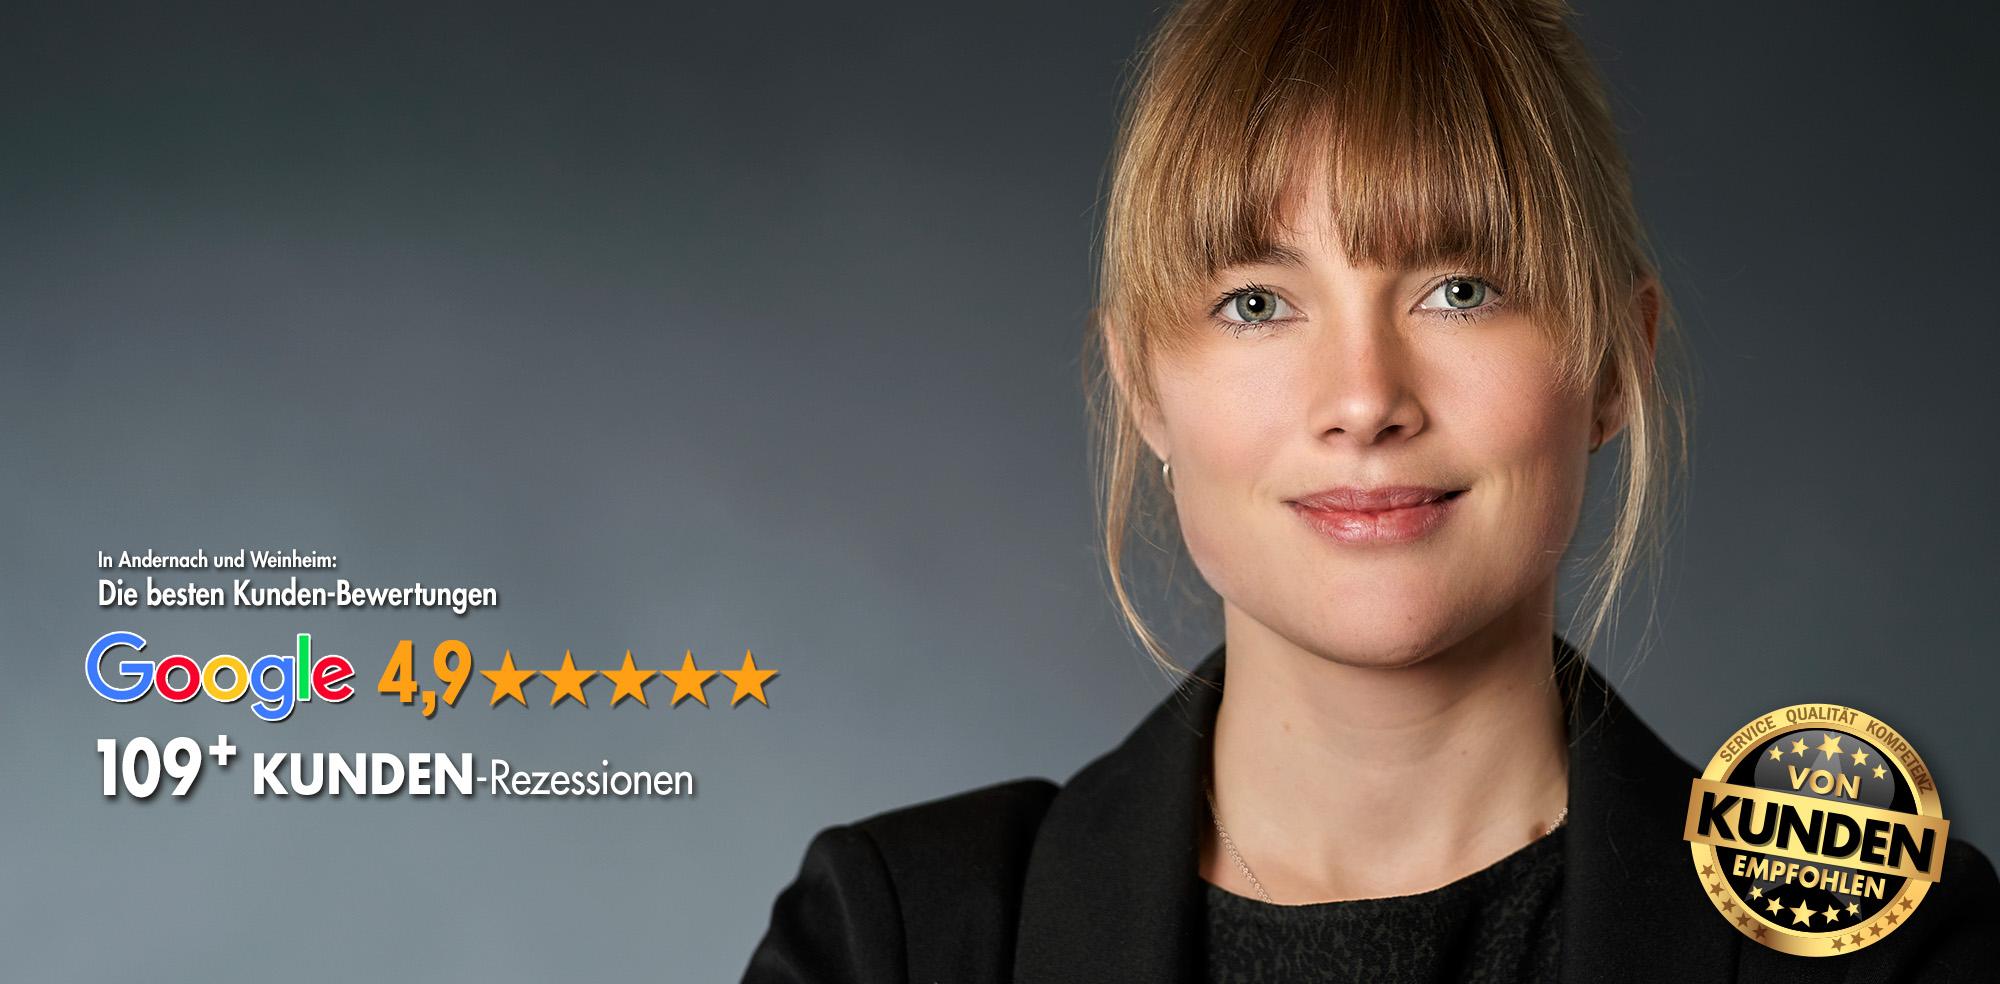 Portraitfoto, Bewerbungsfoto, BusinessPortraits, Aktfoto, Industriefoto, Produktfoto @ BlickFang2 Fotostudio, Filmstudio in Weinheim und Andernach, Fotograf